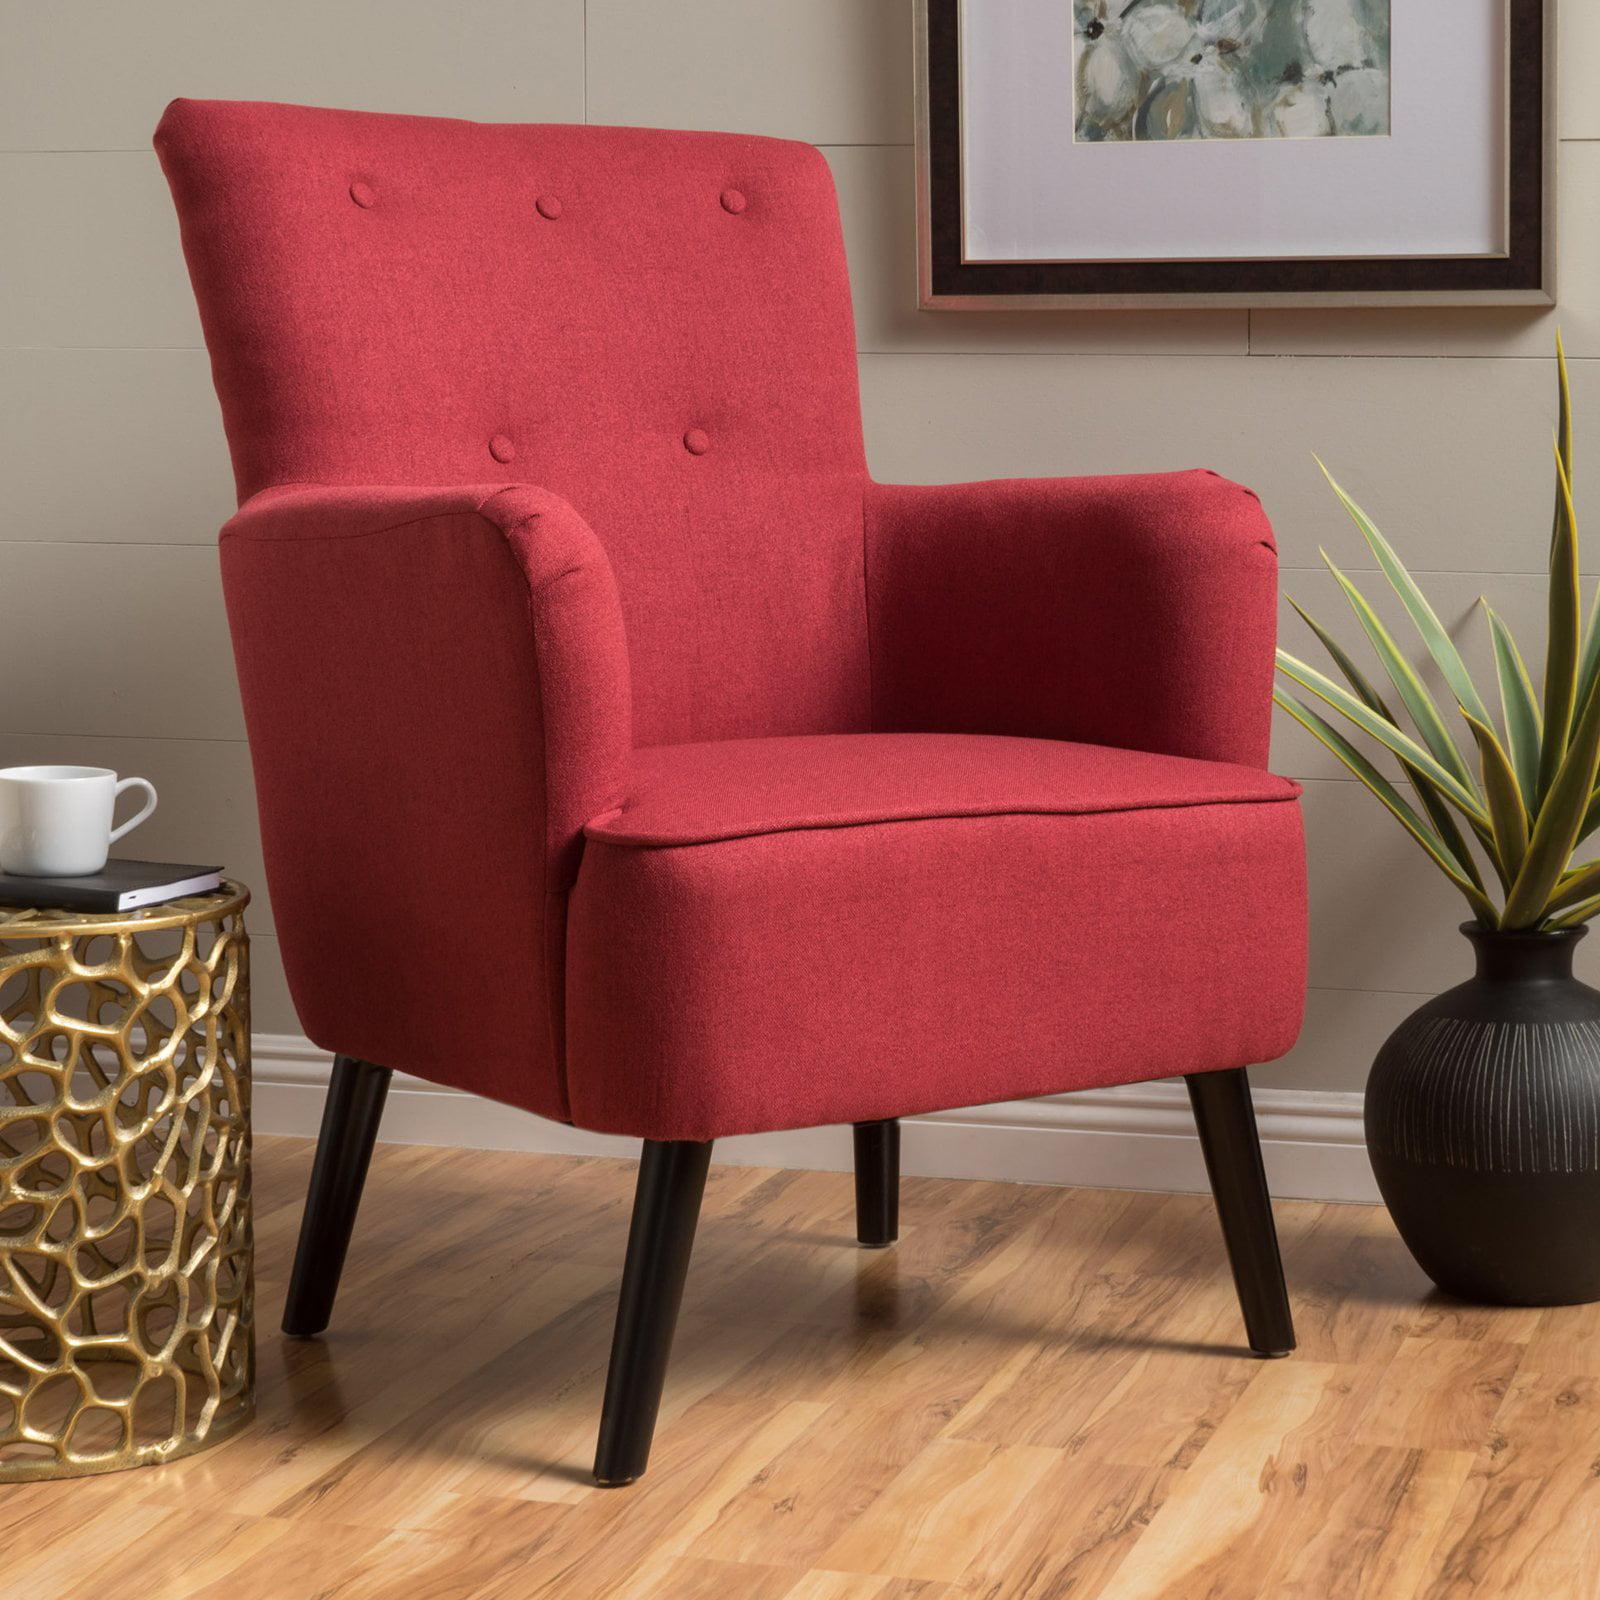 Koali Fabric Chair